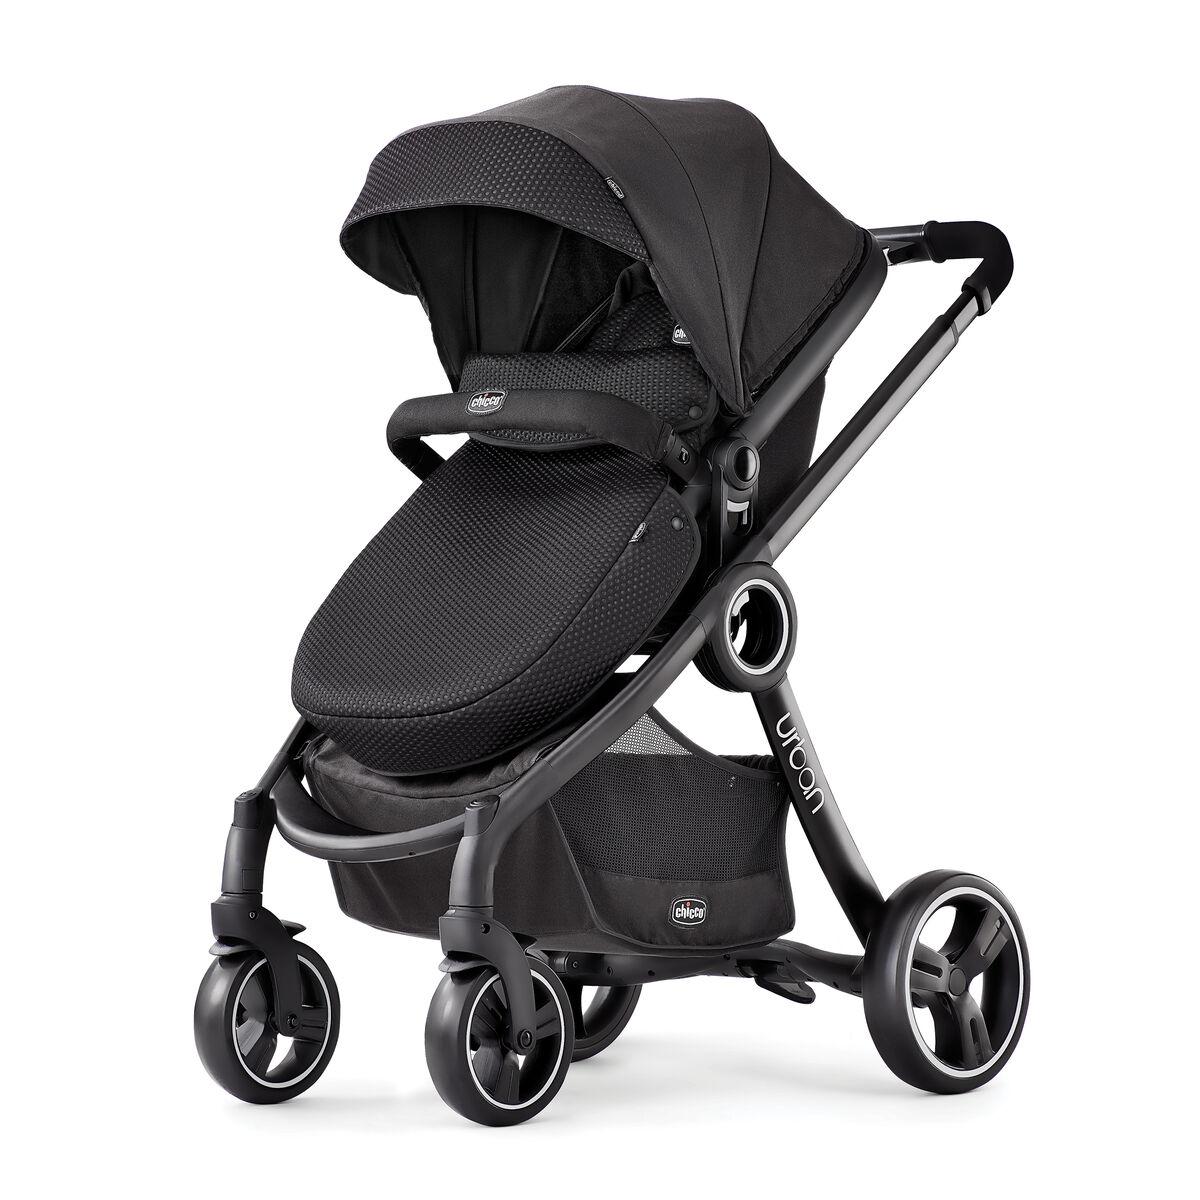 baby gear  baby strollers  chicco stroller - urban in modular stroller  obsidian